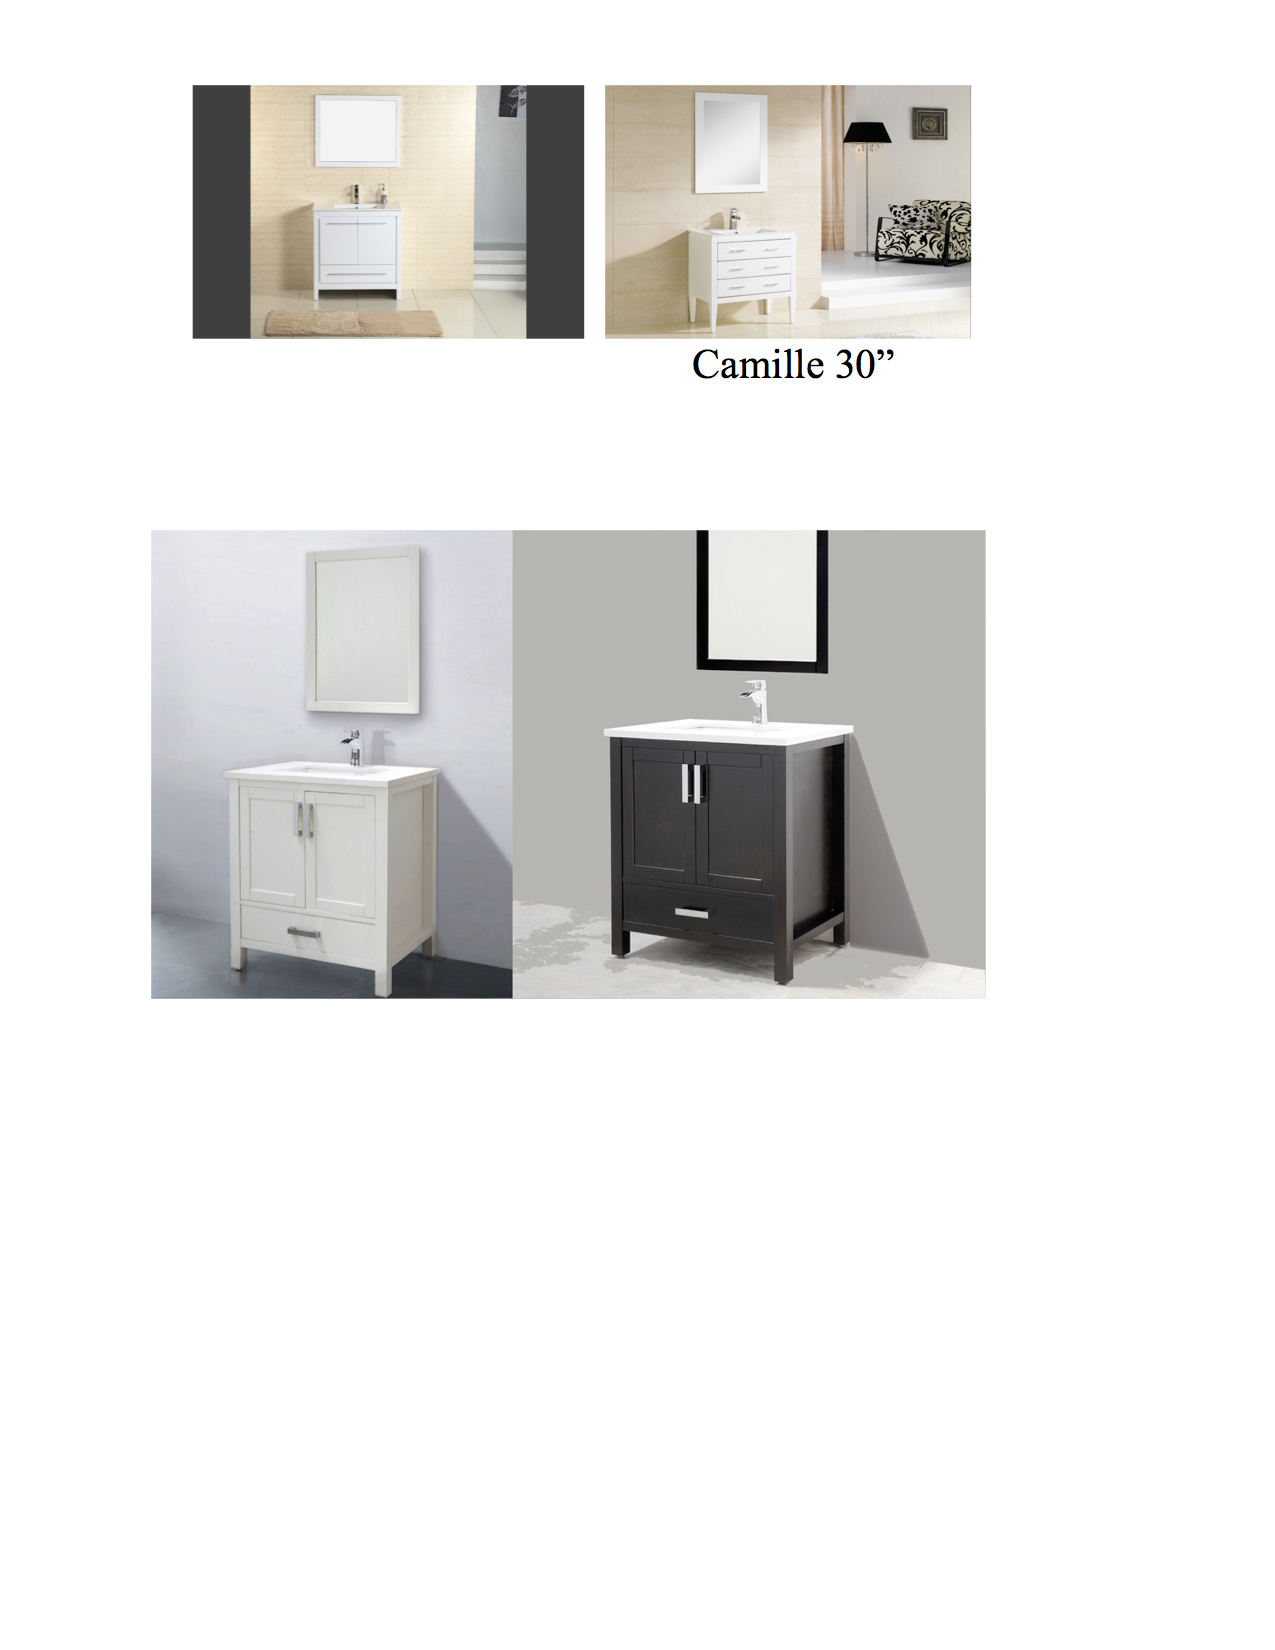 bathcabinet-13